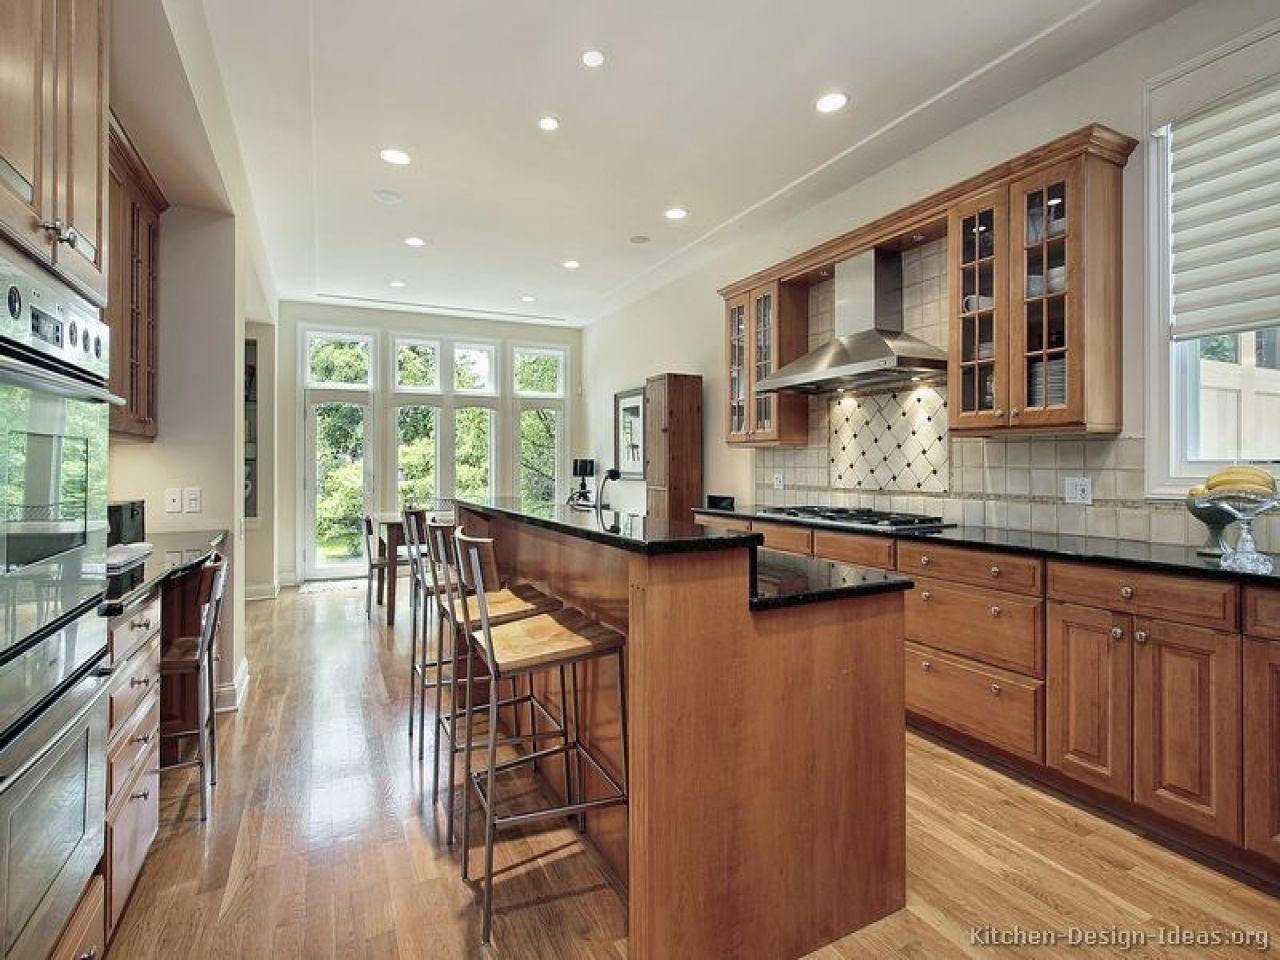 Standard Kitchen Island Bar Height  Httpnavigatorspb Pleasing Standard Kitchen Design Design Ideas